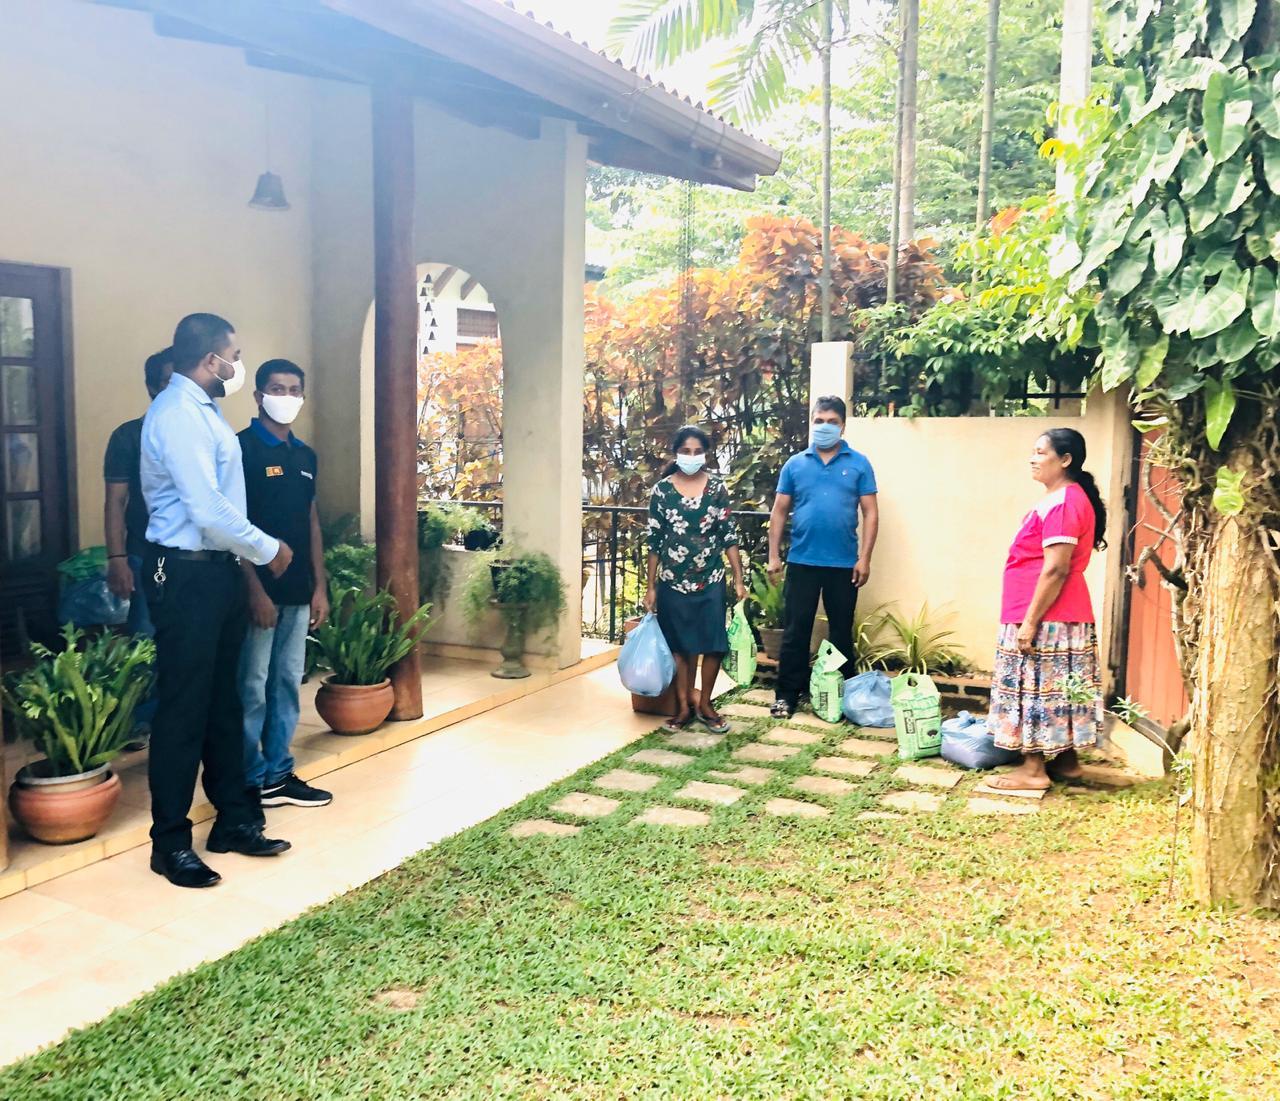 Rotaract Club of Kandy